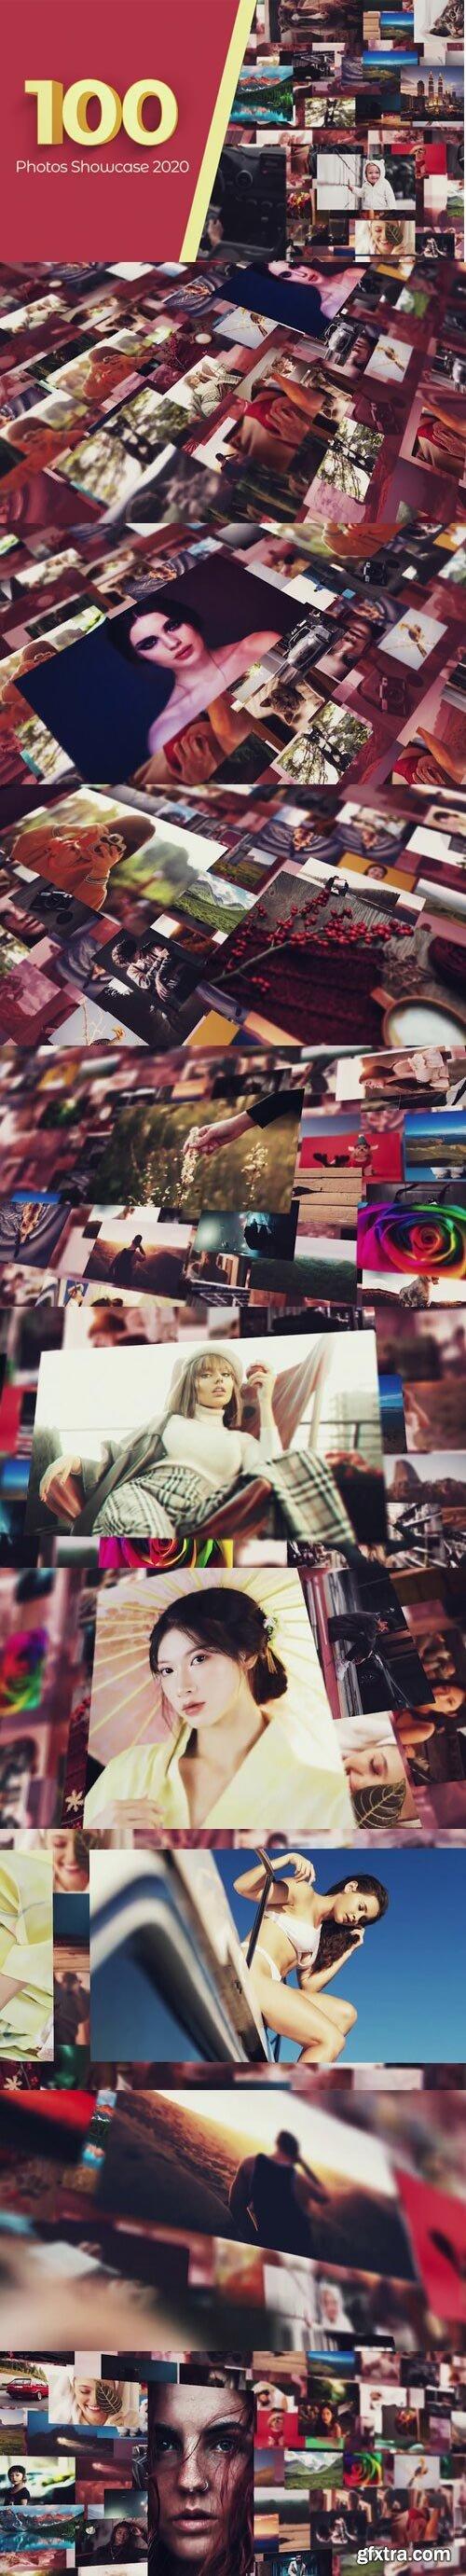 Videohive - 100 Photos Showcase Intro - 29886638